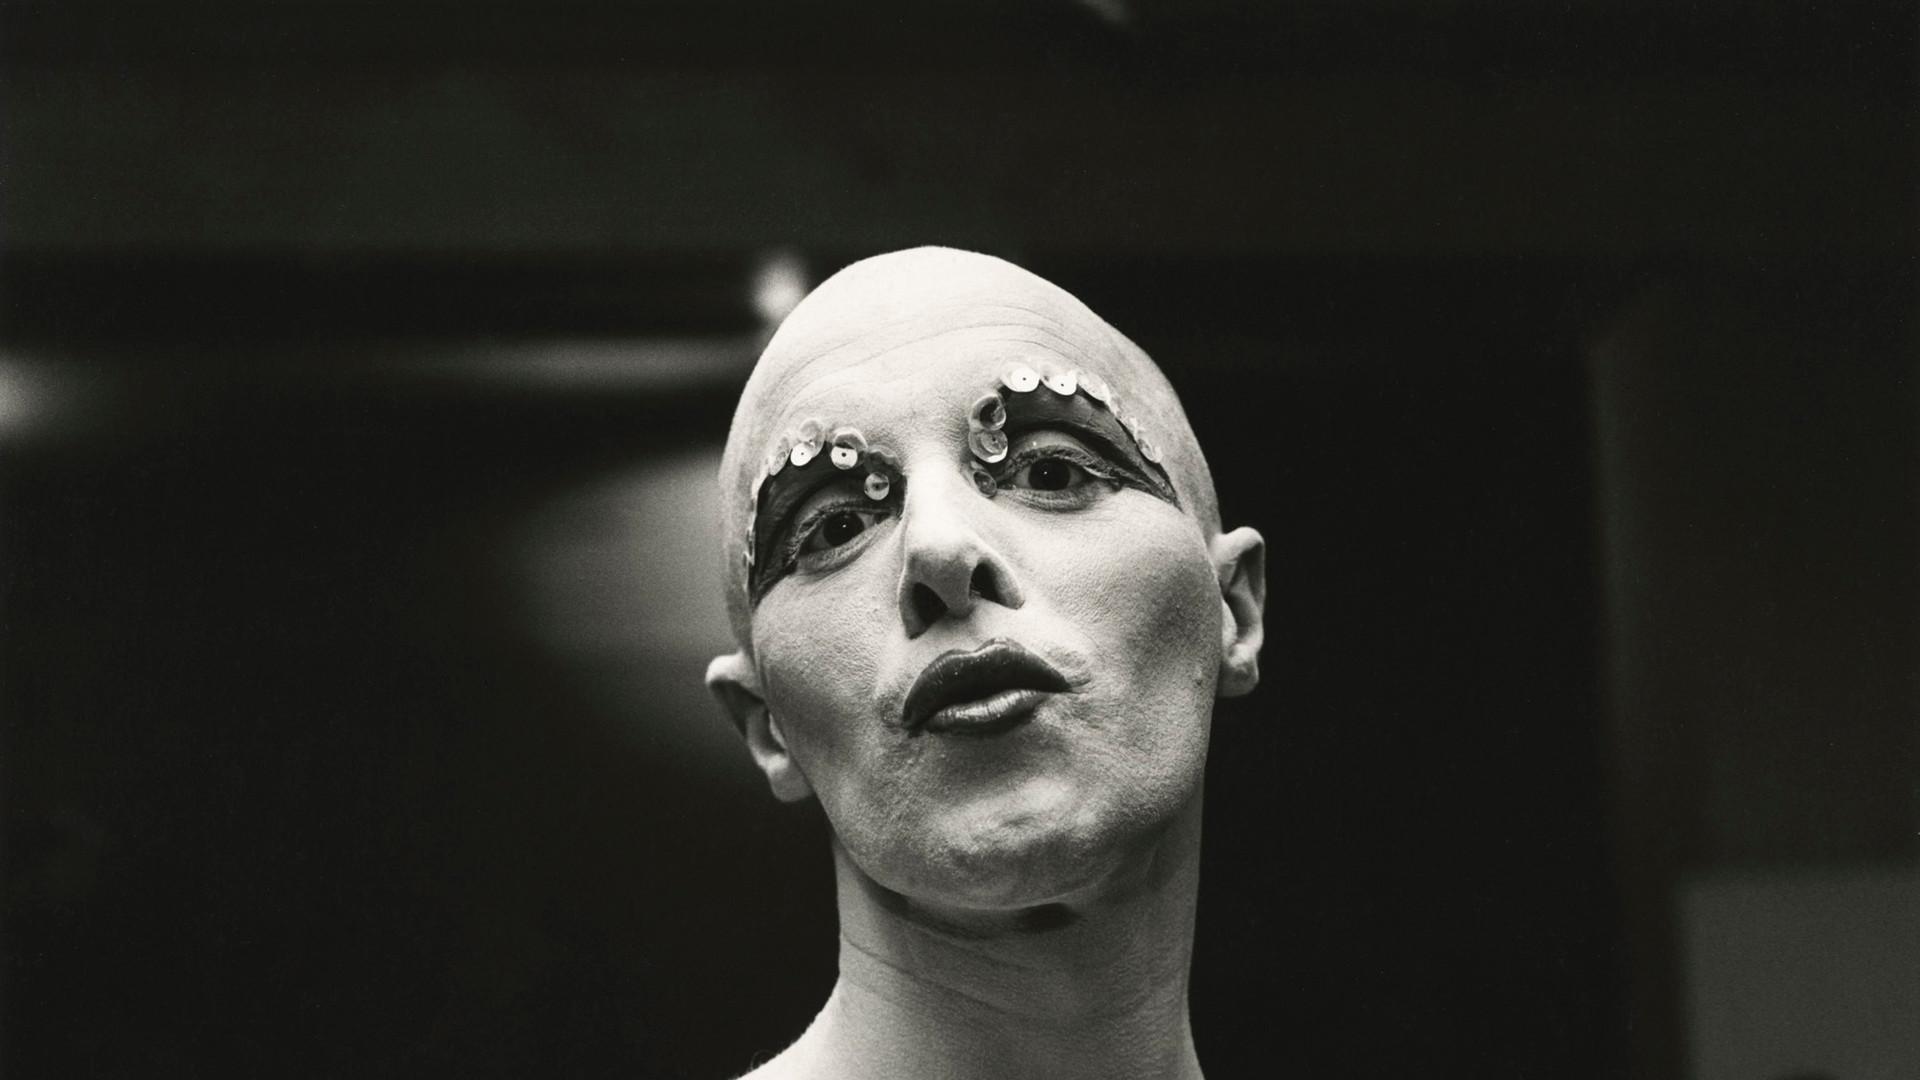 Peter Hujar, Larry Ree Backstage, c. 1973